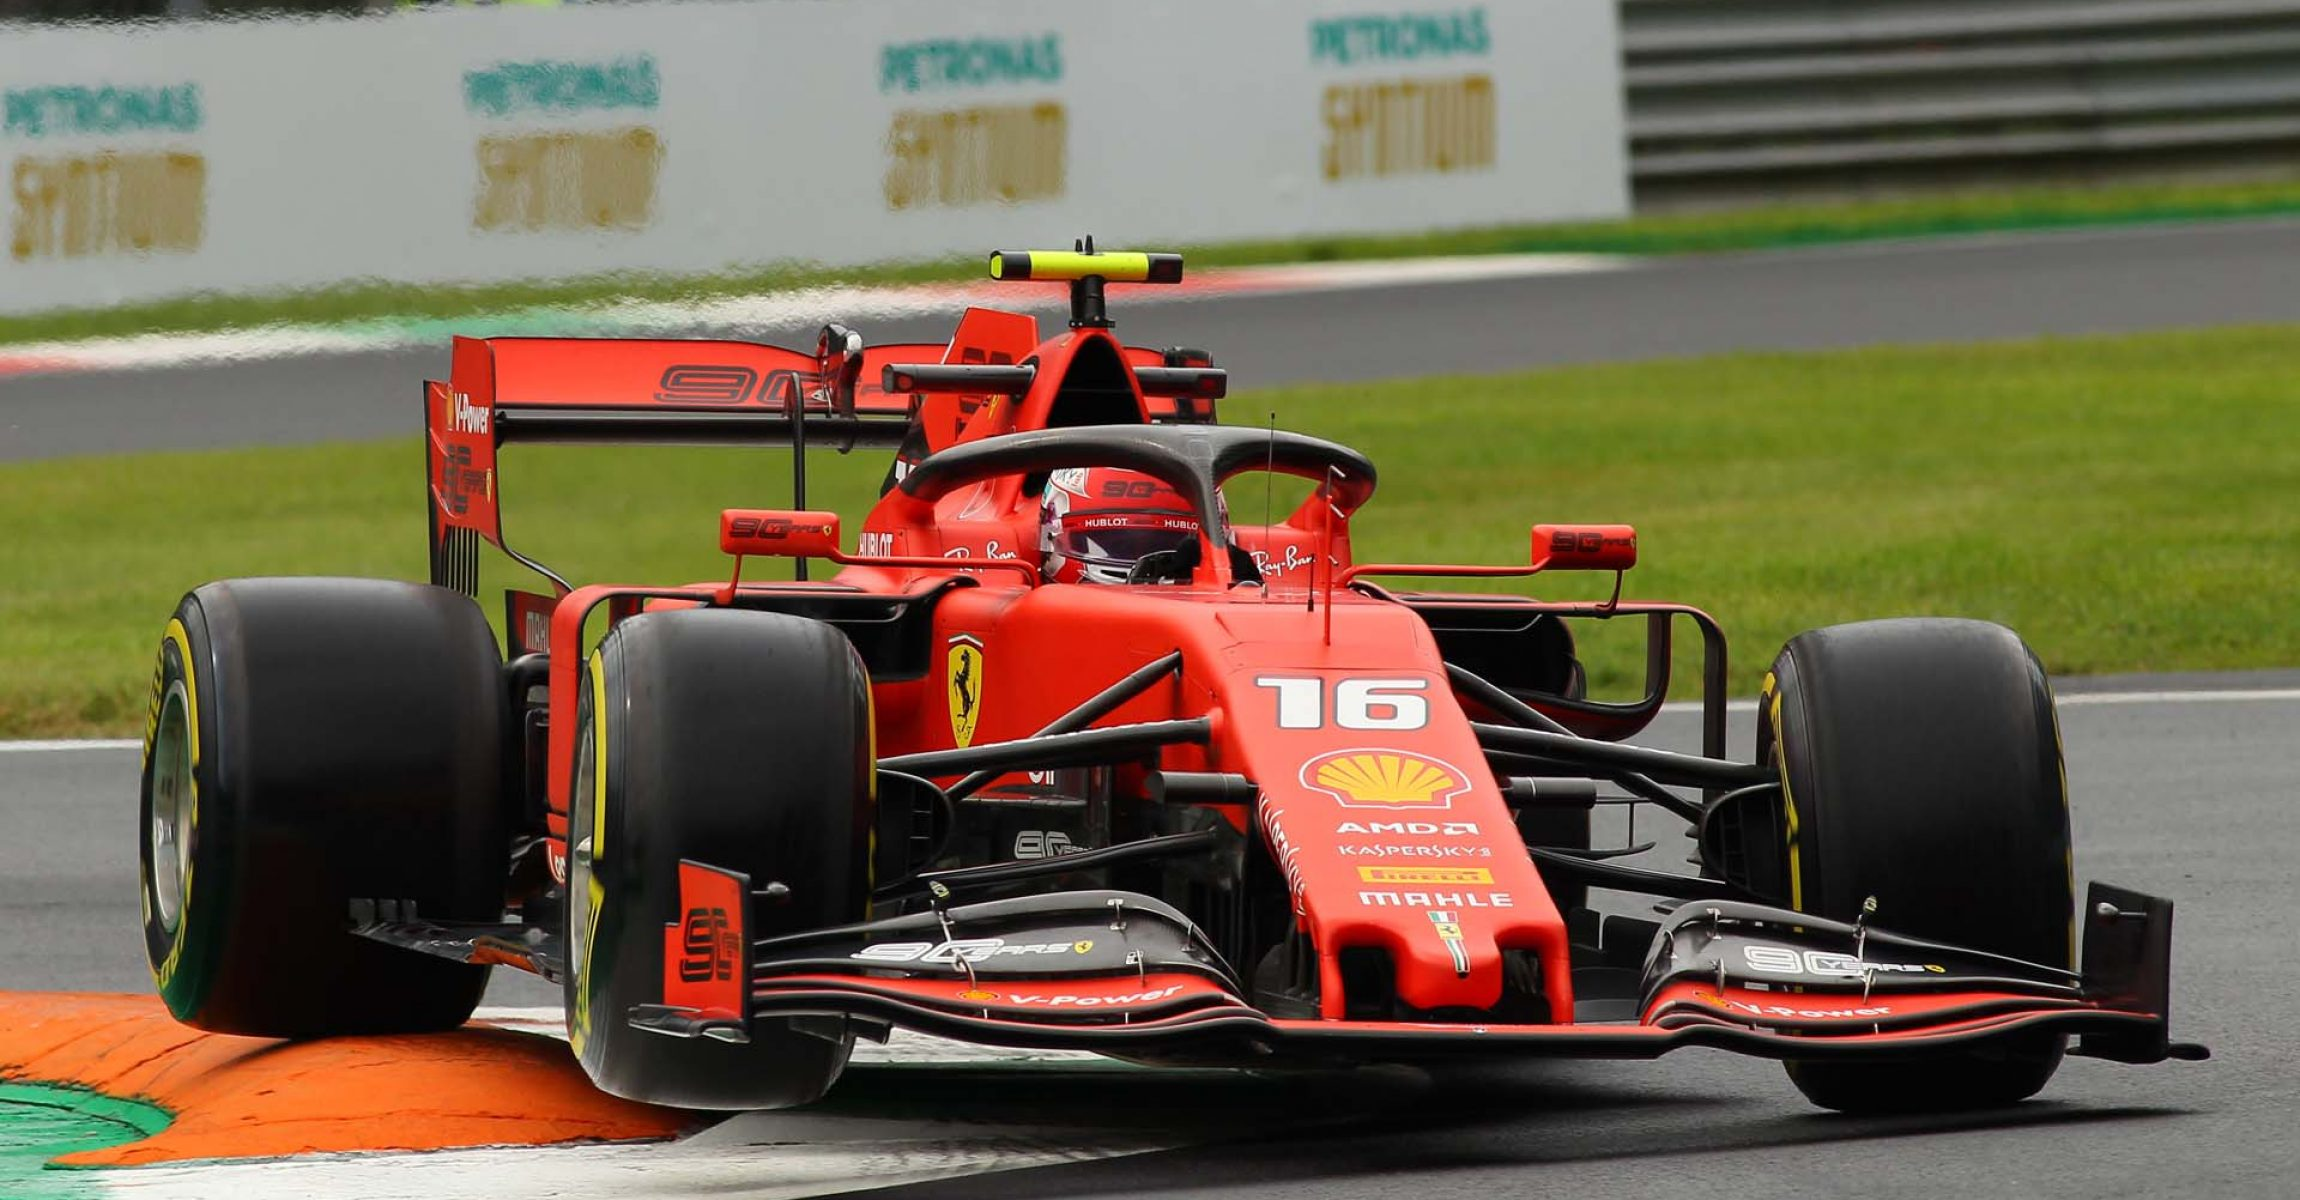 Italian Grand Prix 2019, Monza, Friday, Charles Leclerc, Ferrari